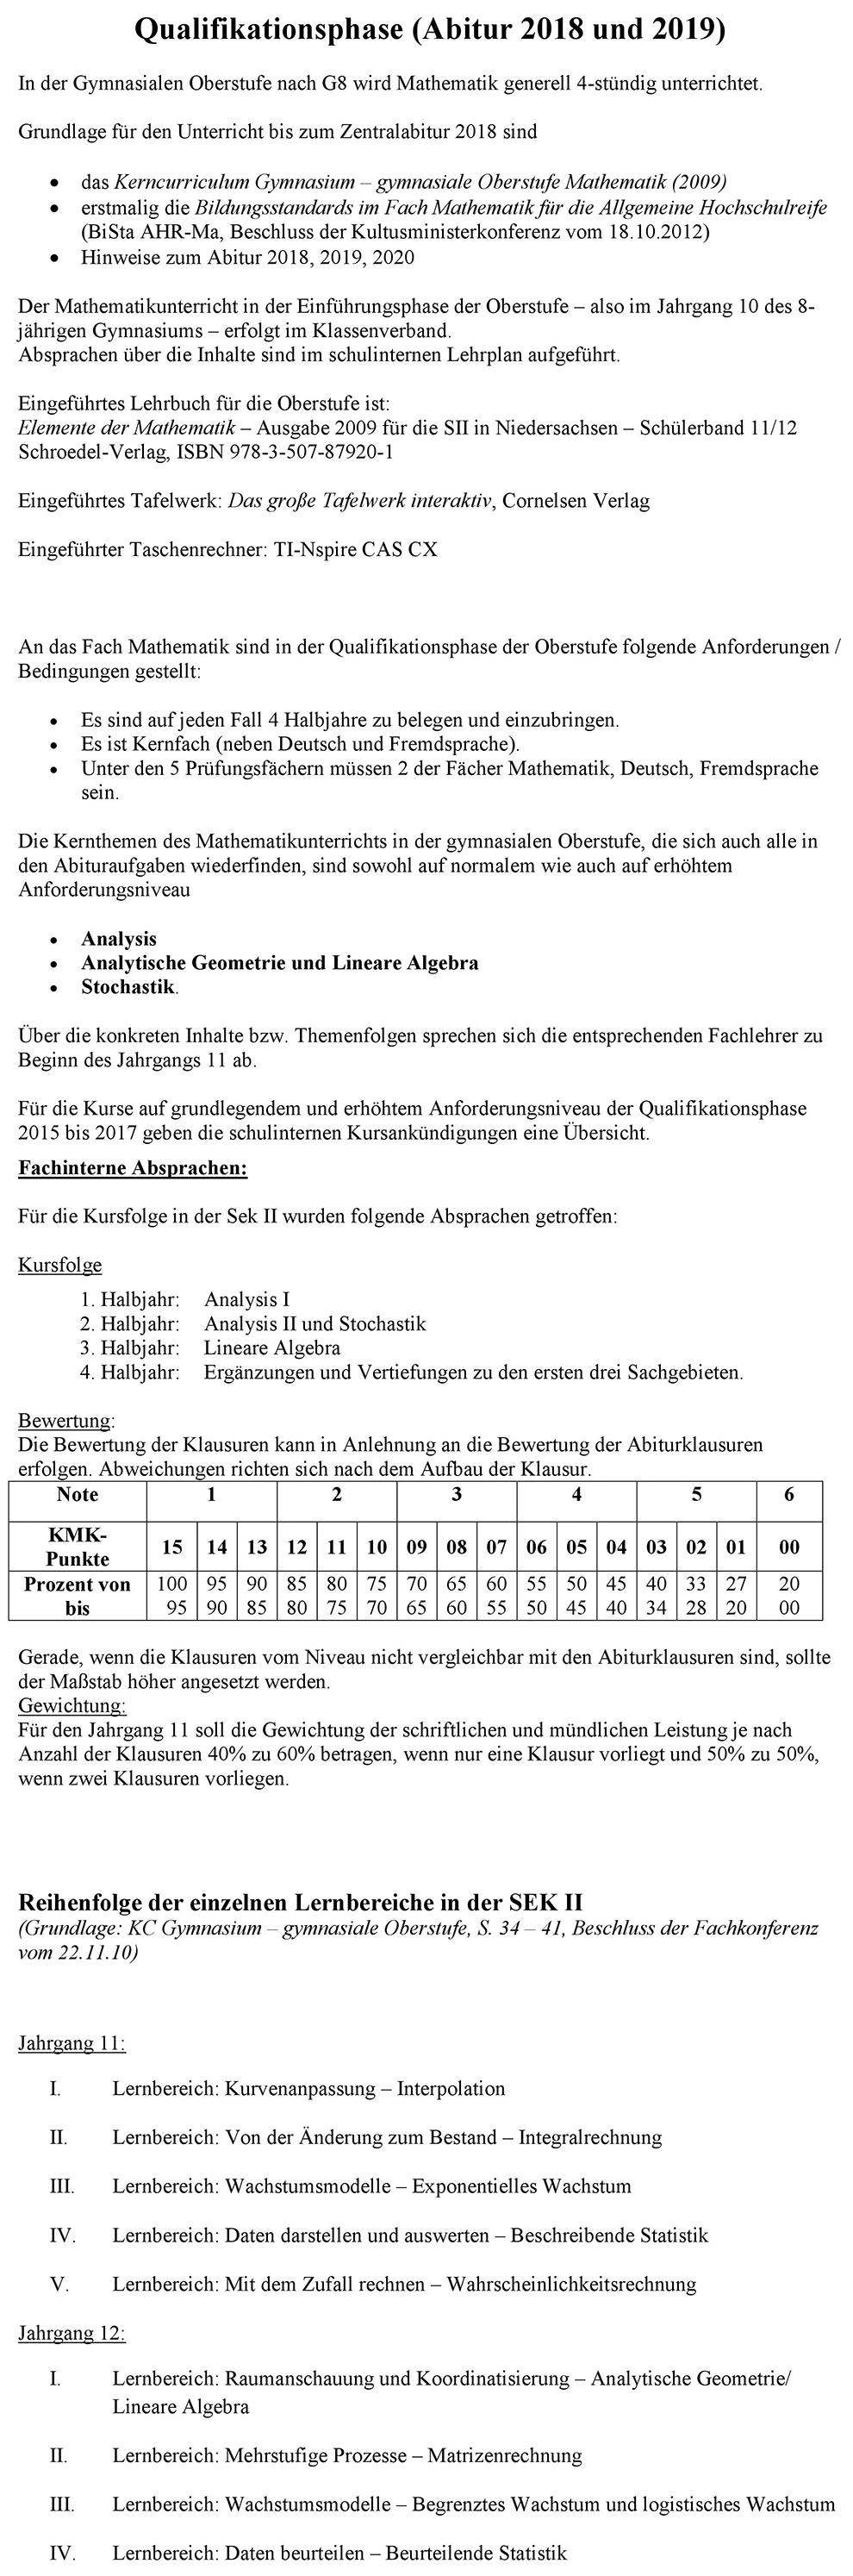 Fine Gemischter Algebra Arbeitsblatt Elaboration - Mathe ...